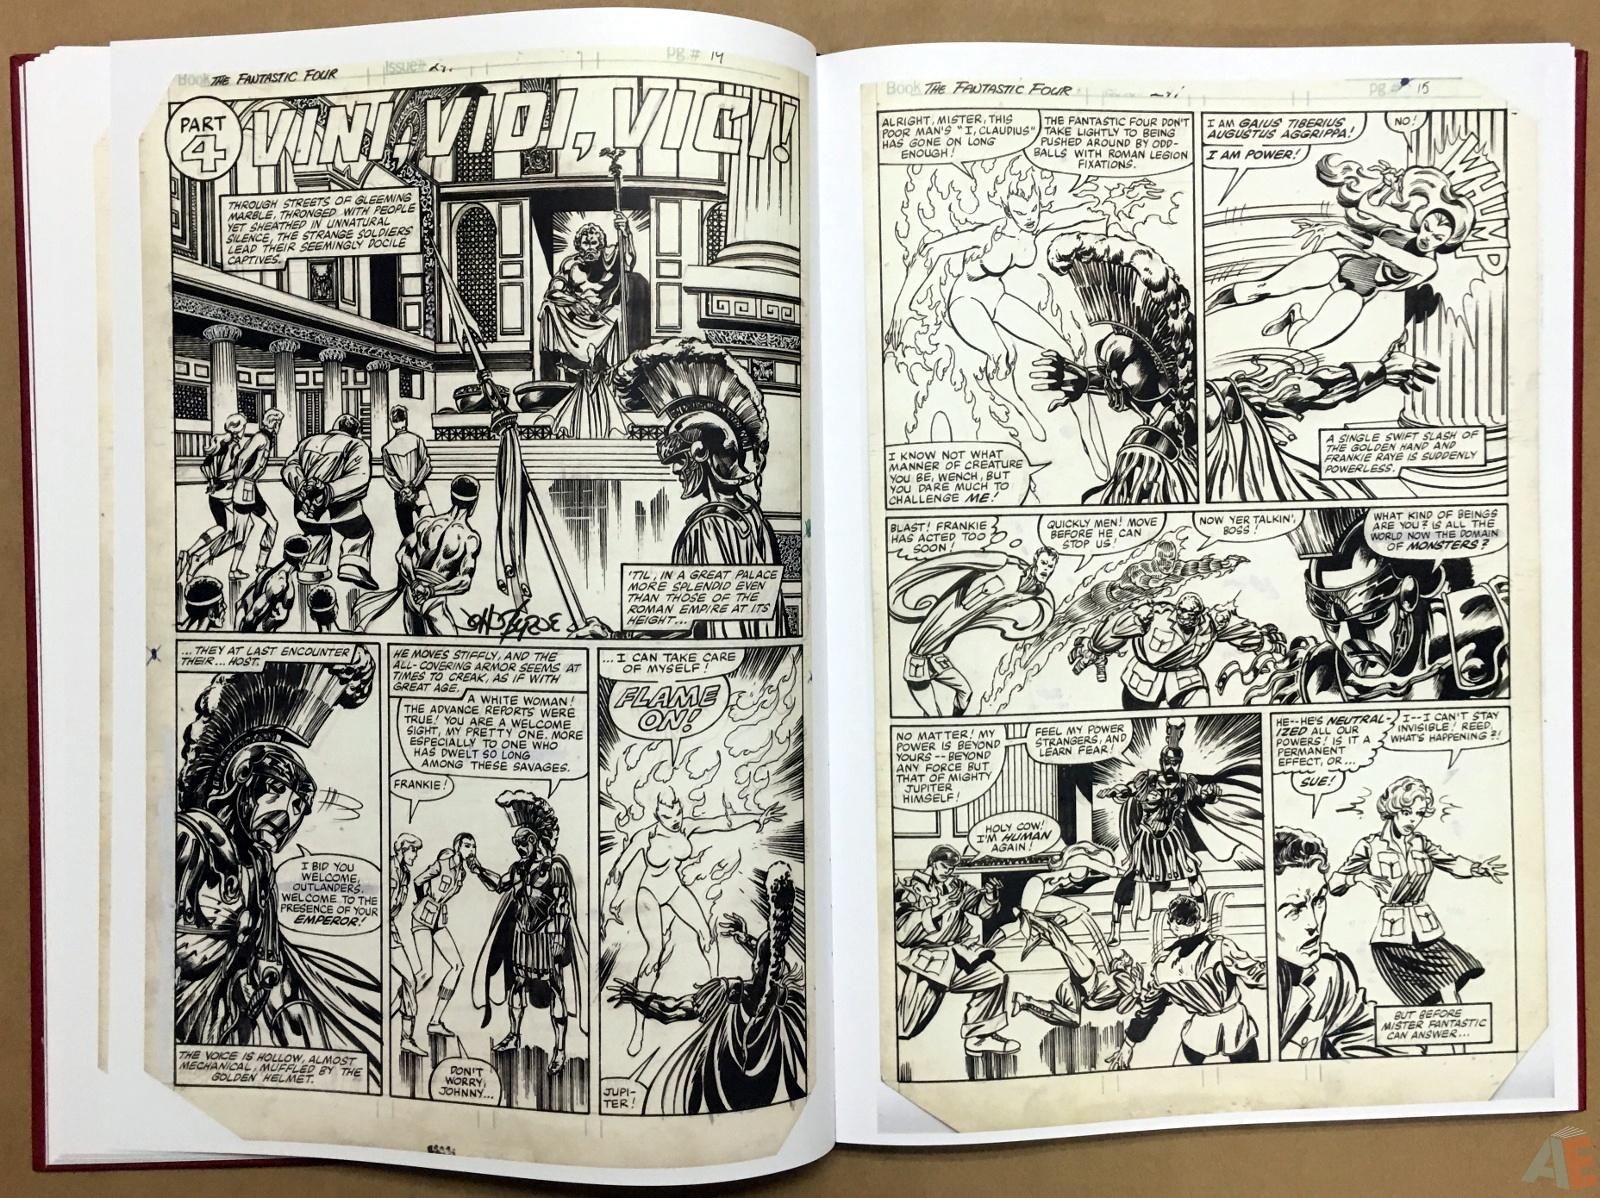 John Byrne's The Fantastic Four Artist's Edition 20